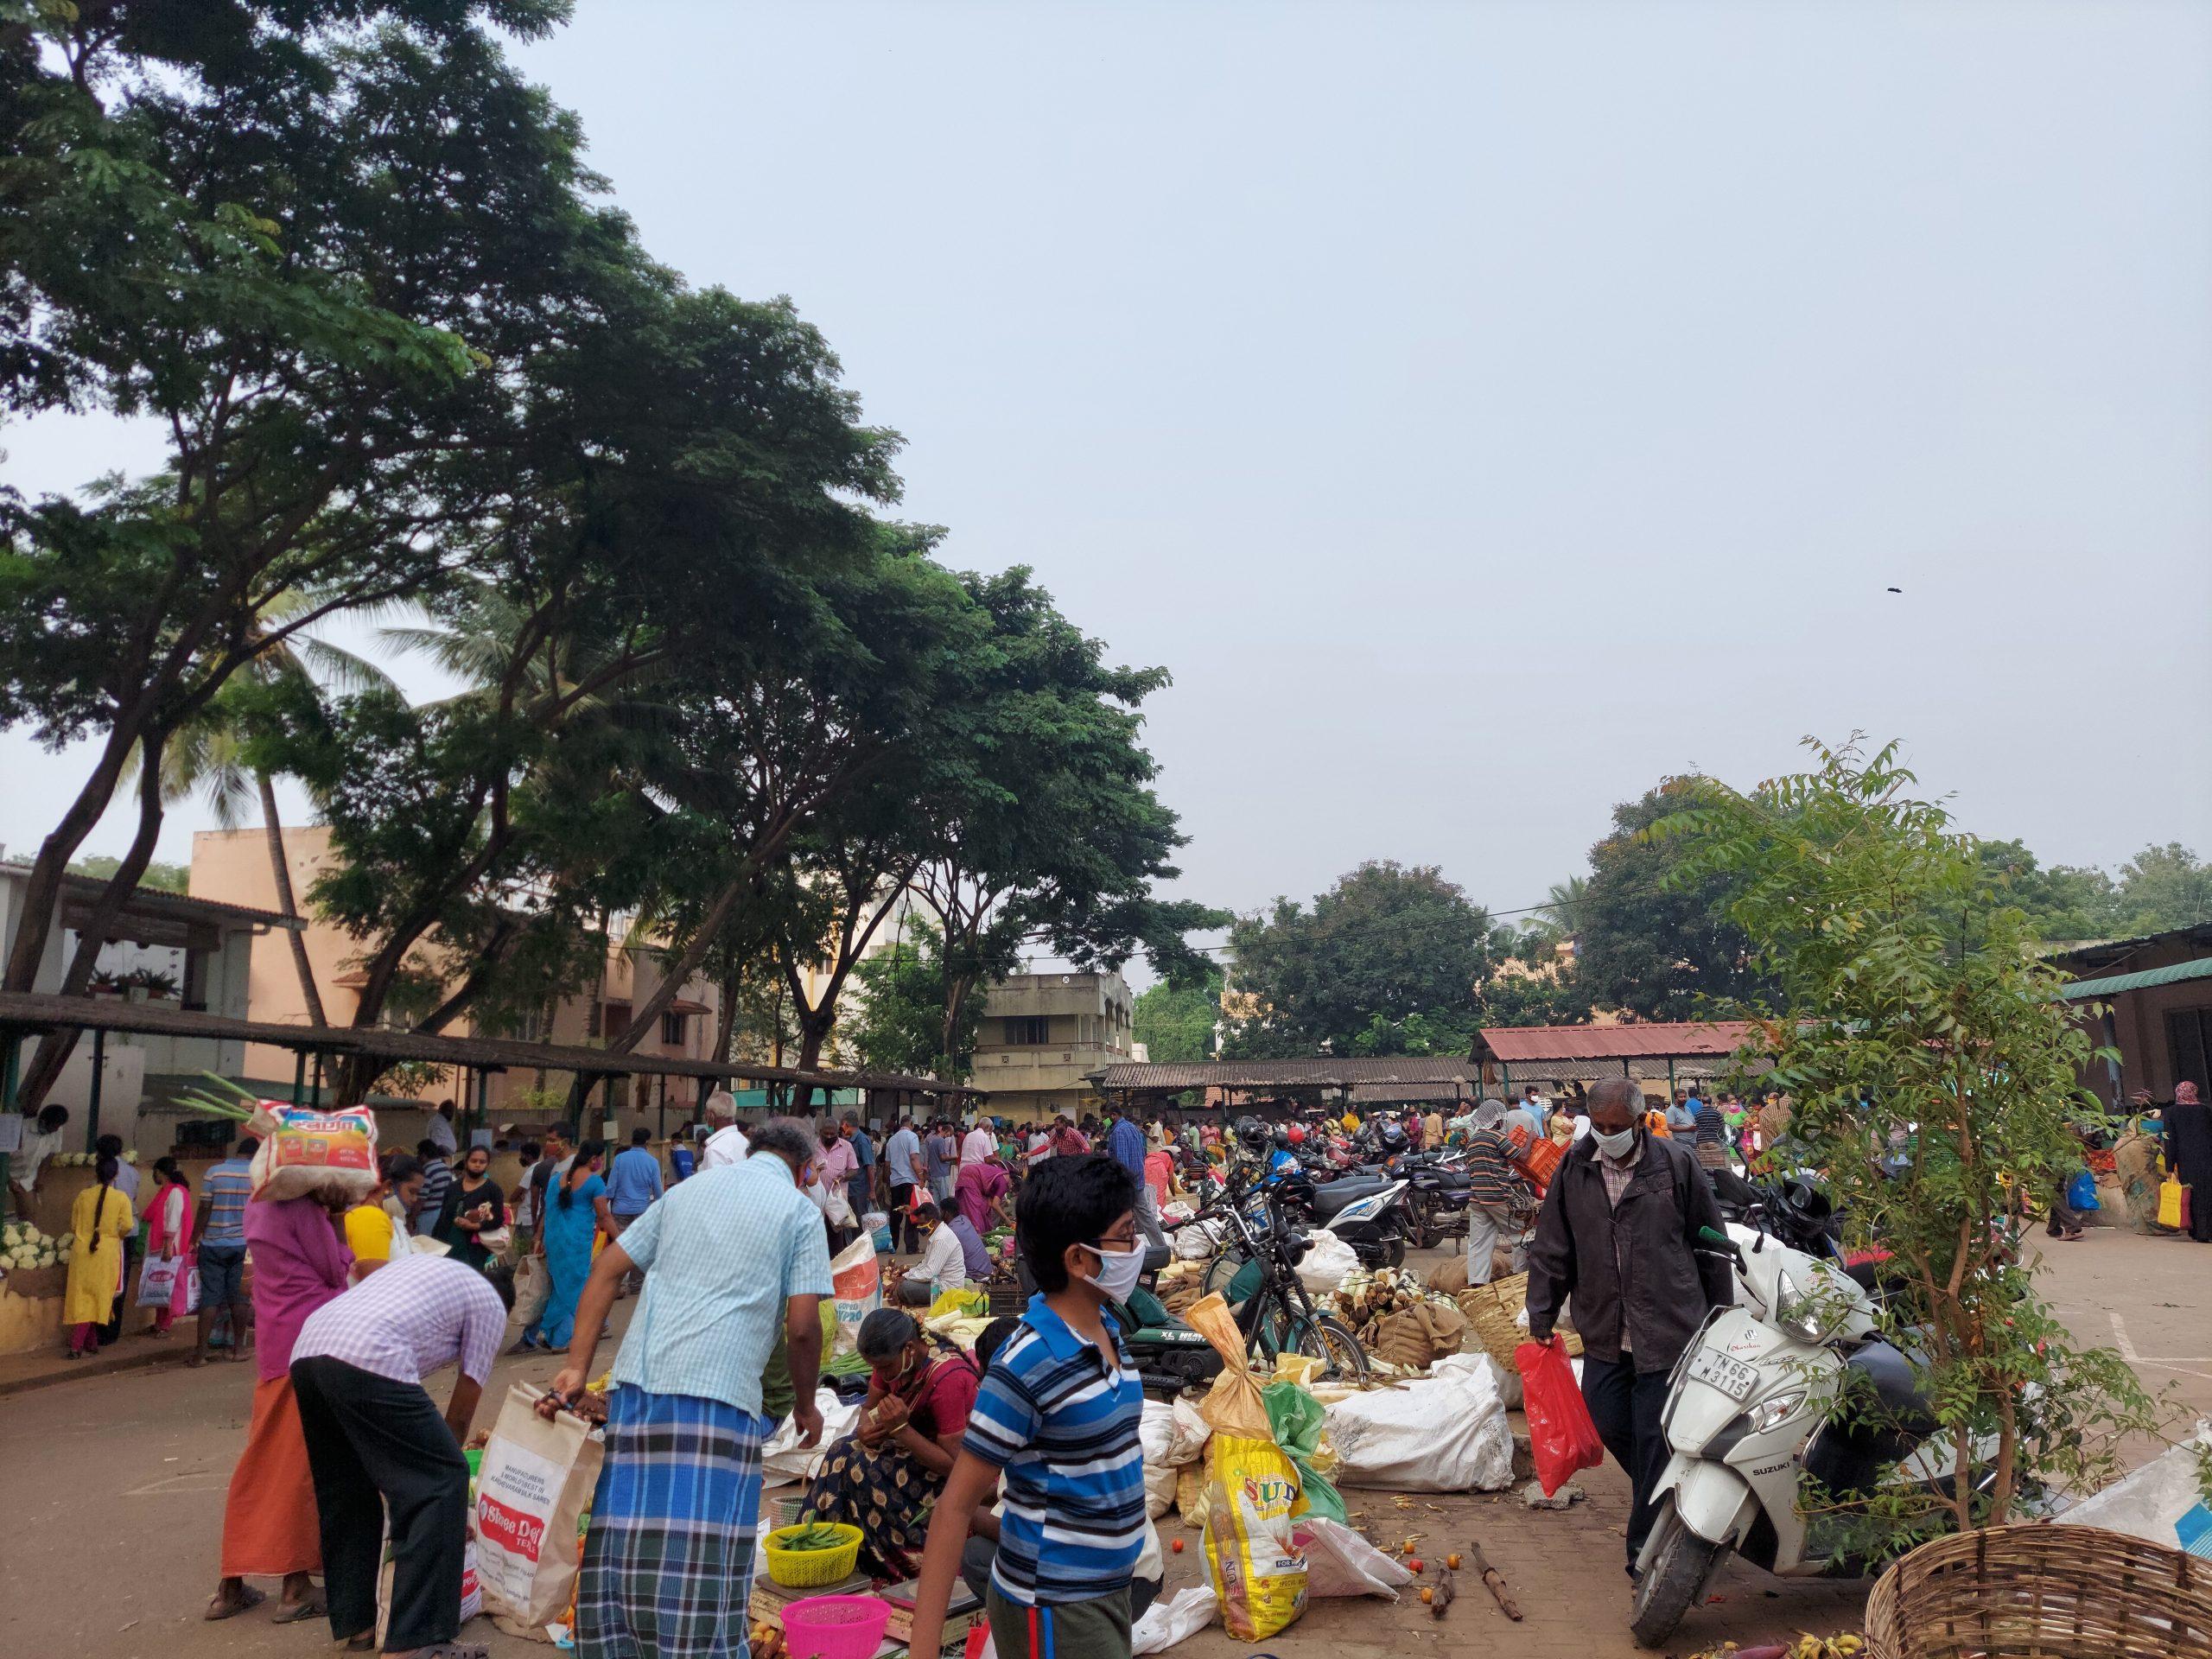 A crowded market